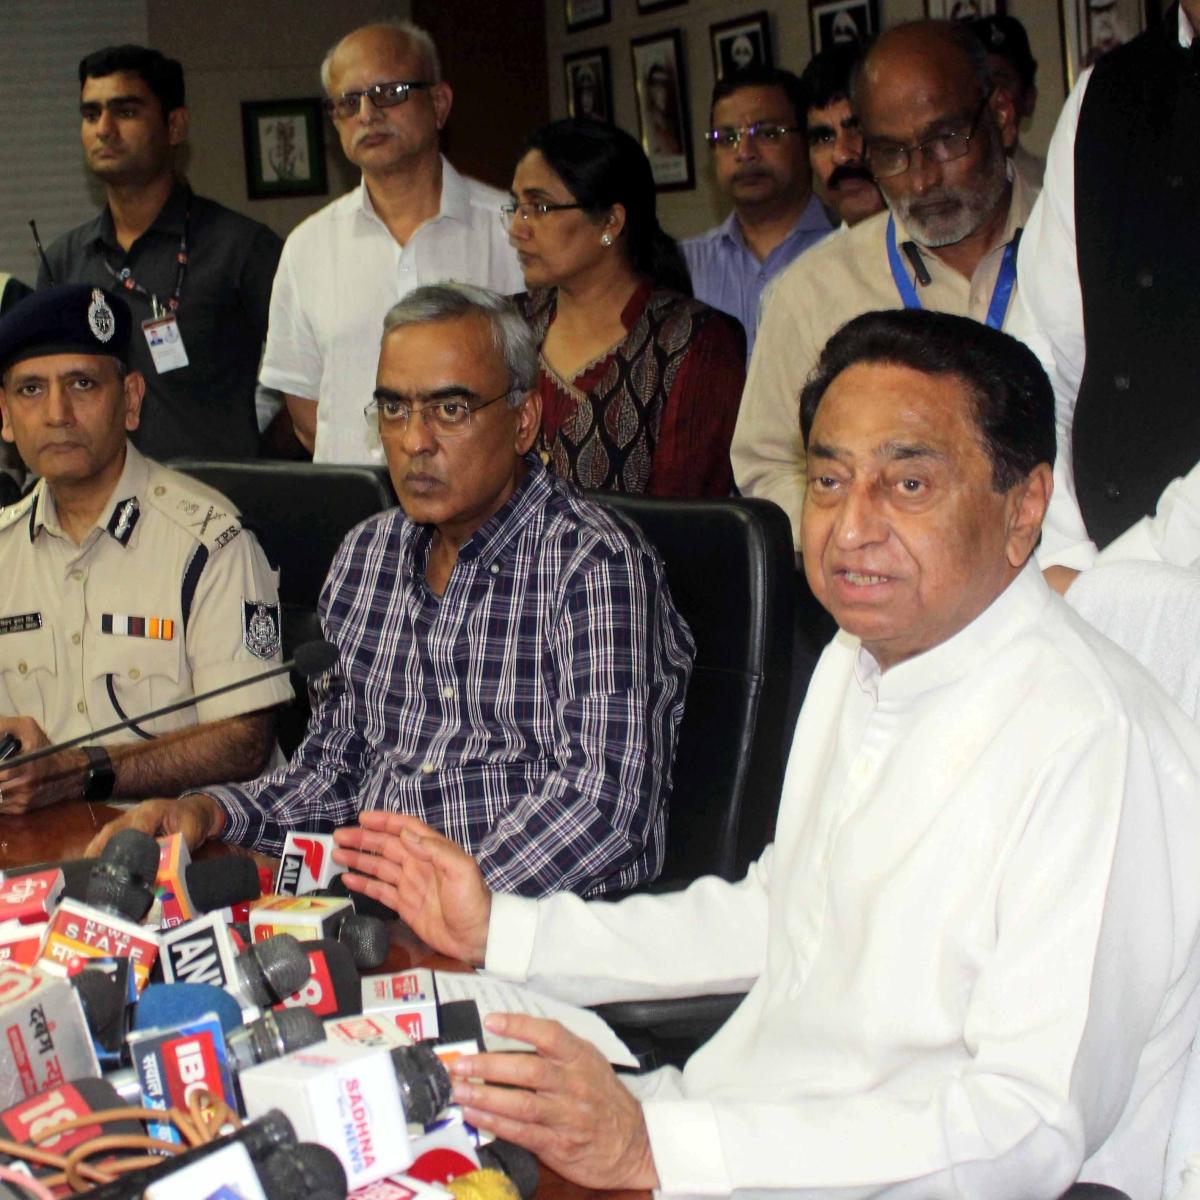 Bhopal: Don't be part of celebration, agitation: Kamal Nath